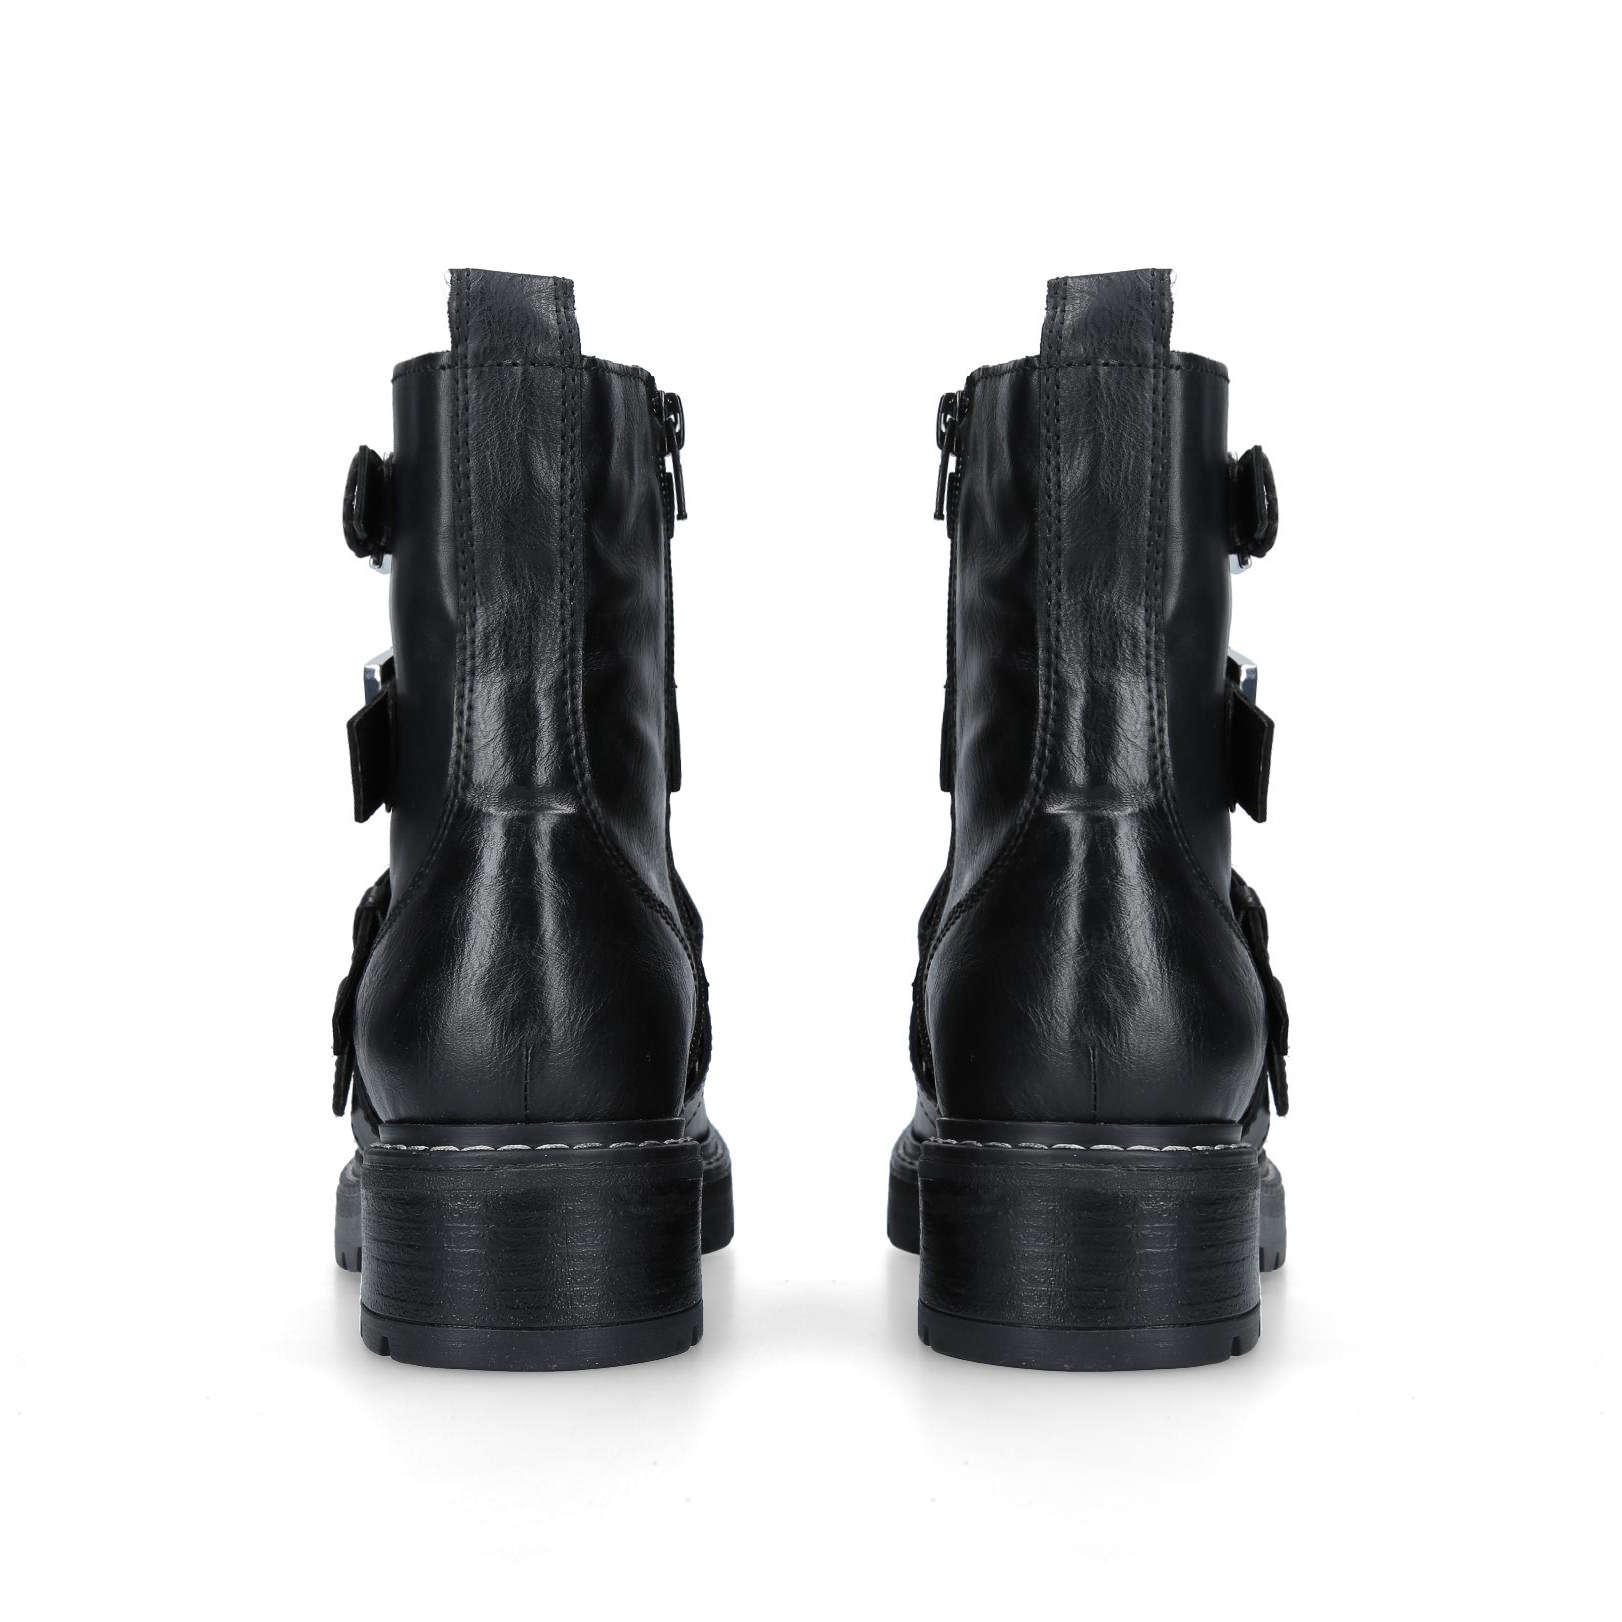 SPRINT - CARVELA Ankle Boots